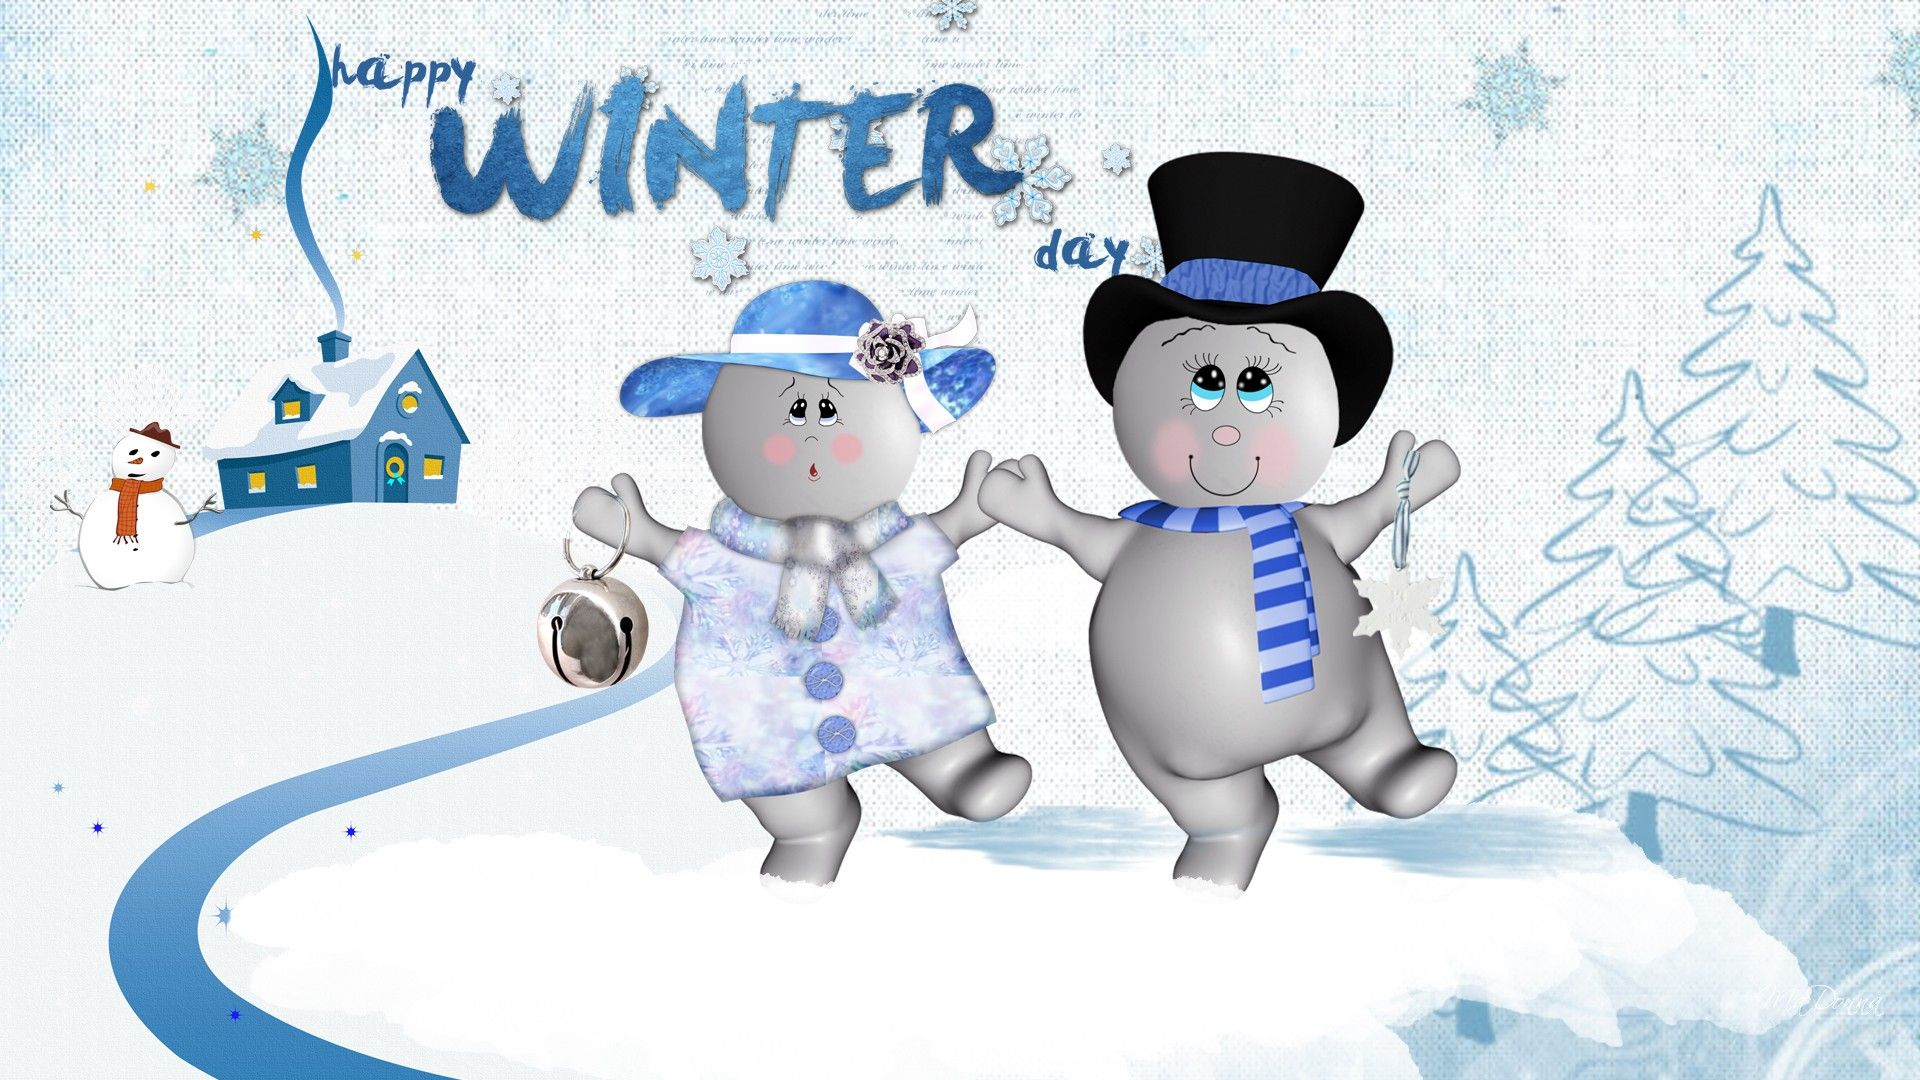 Hd Dancing Snowmen Wallpaper Download Free 88445 Snowman Wallpaper Free Winter Wallpaper Winter Wallpaper